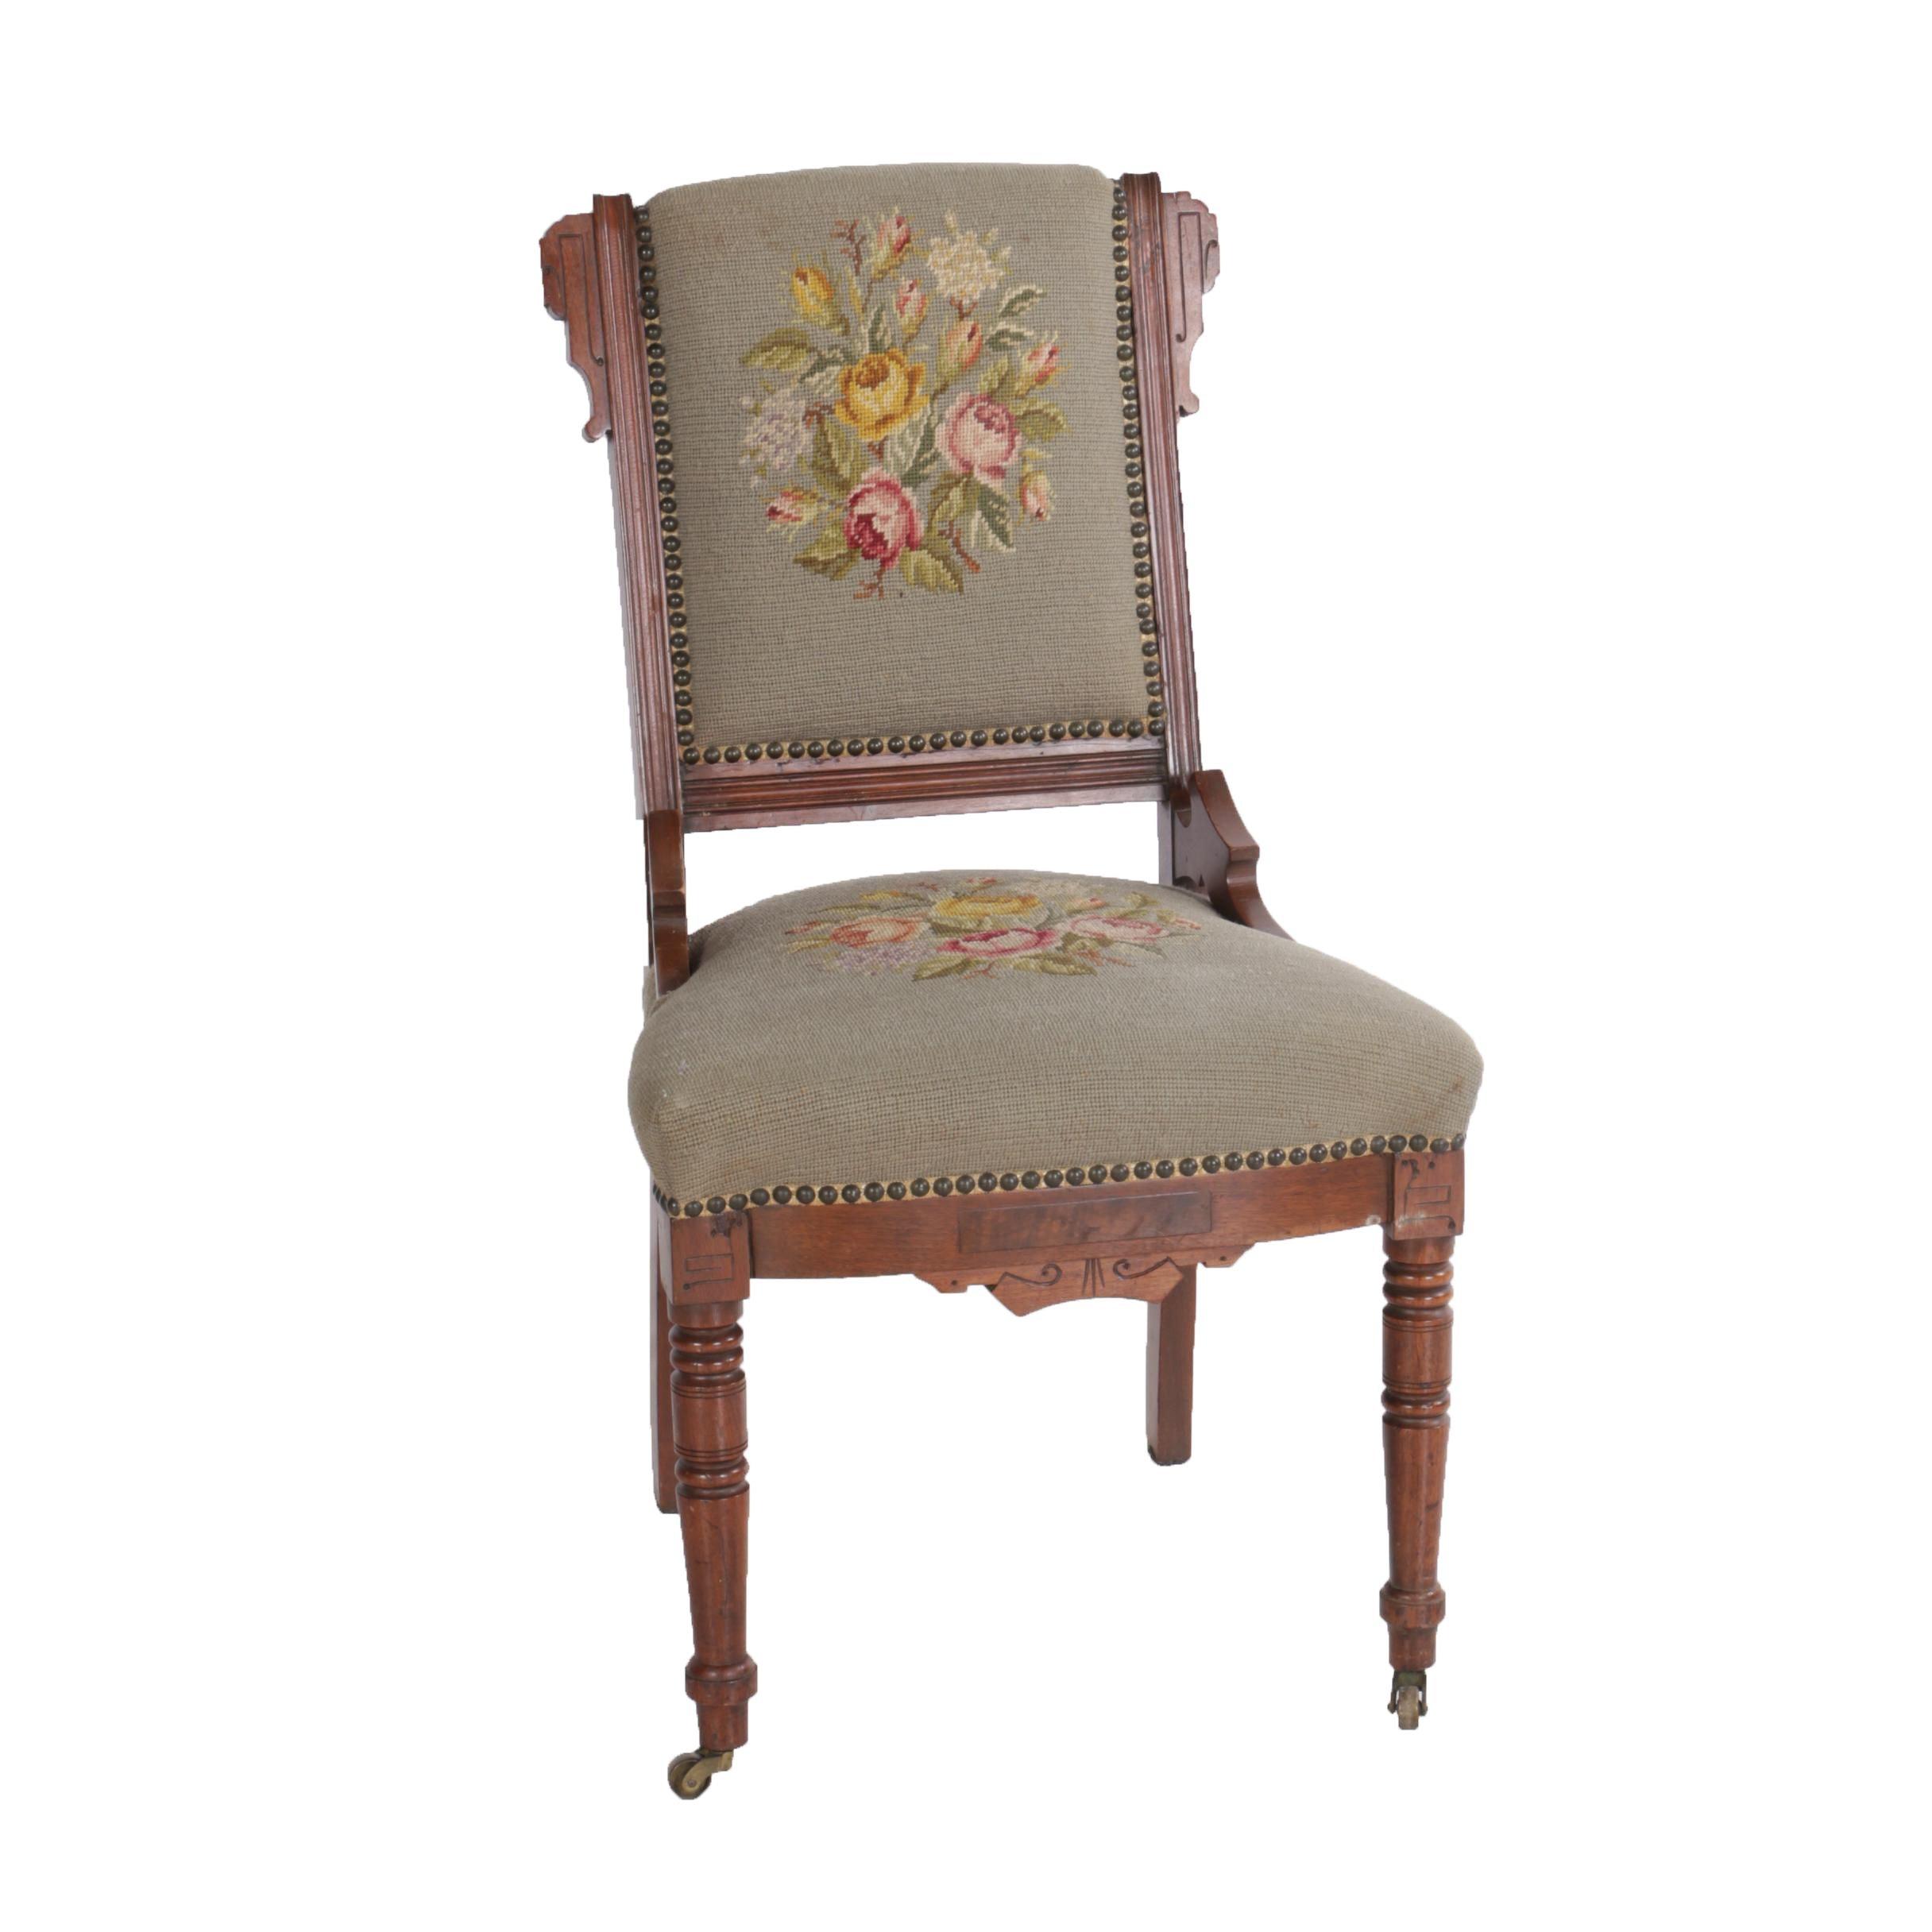 Antique Victorian Eastlake Walnut Needlepoint Chair ...